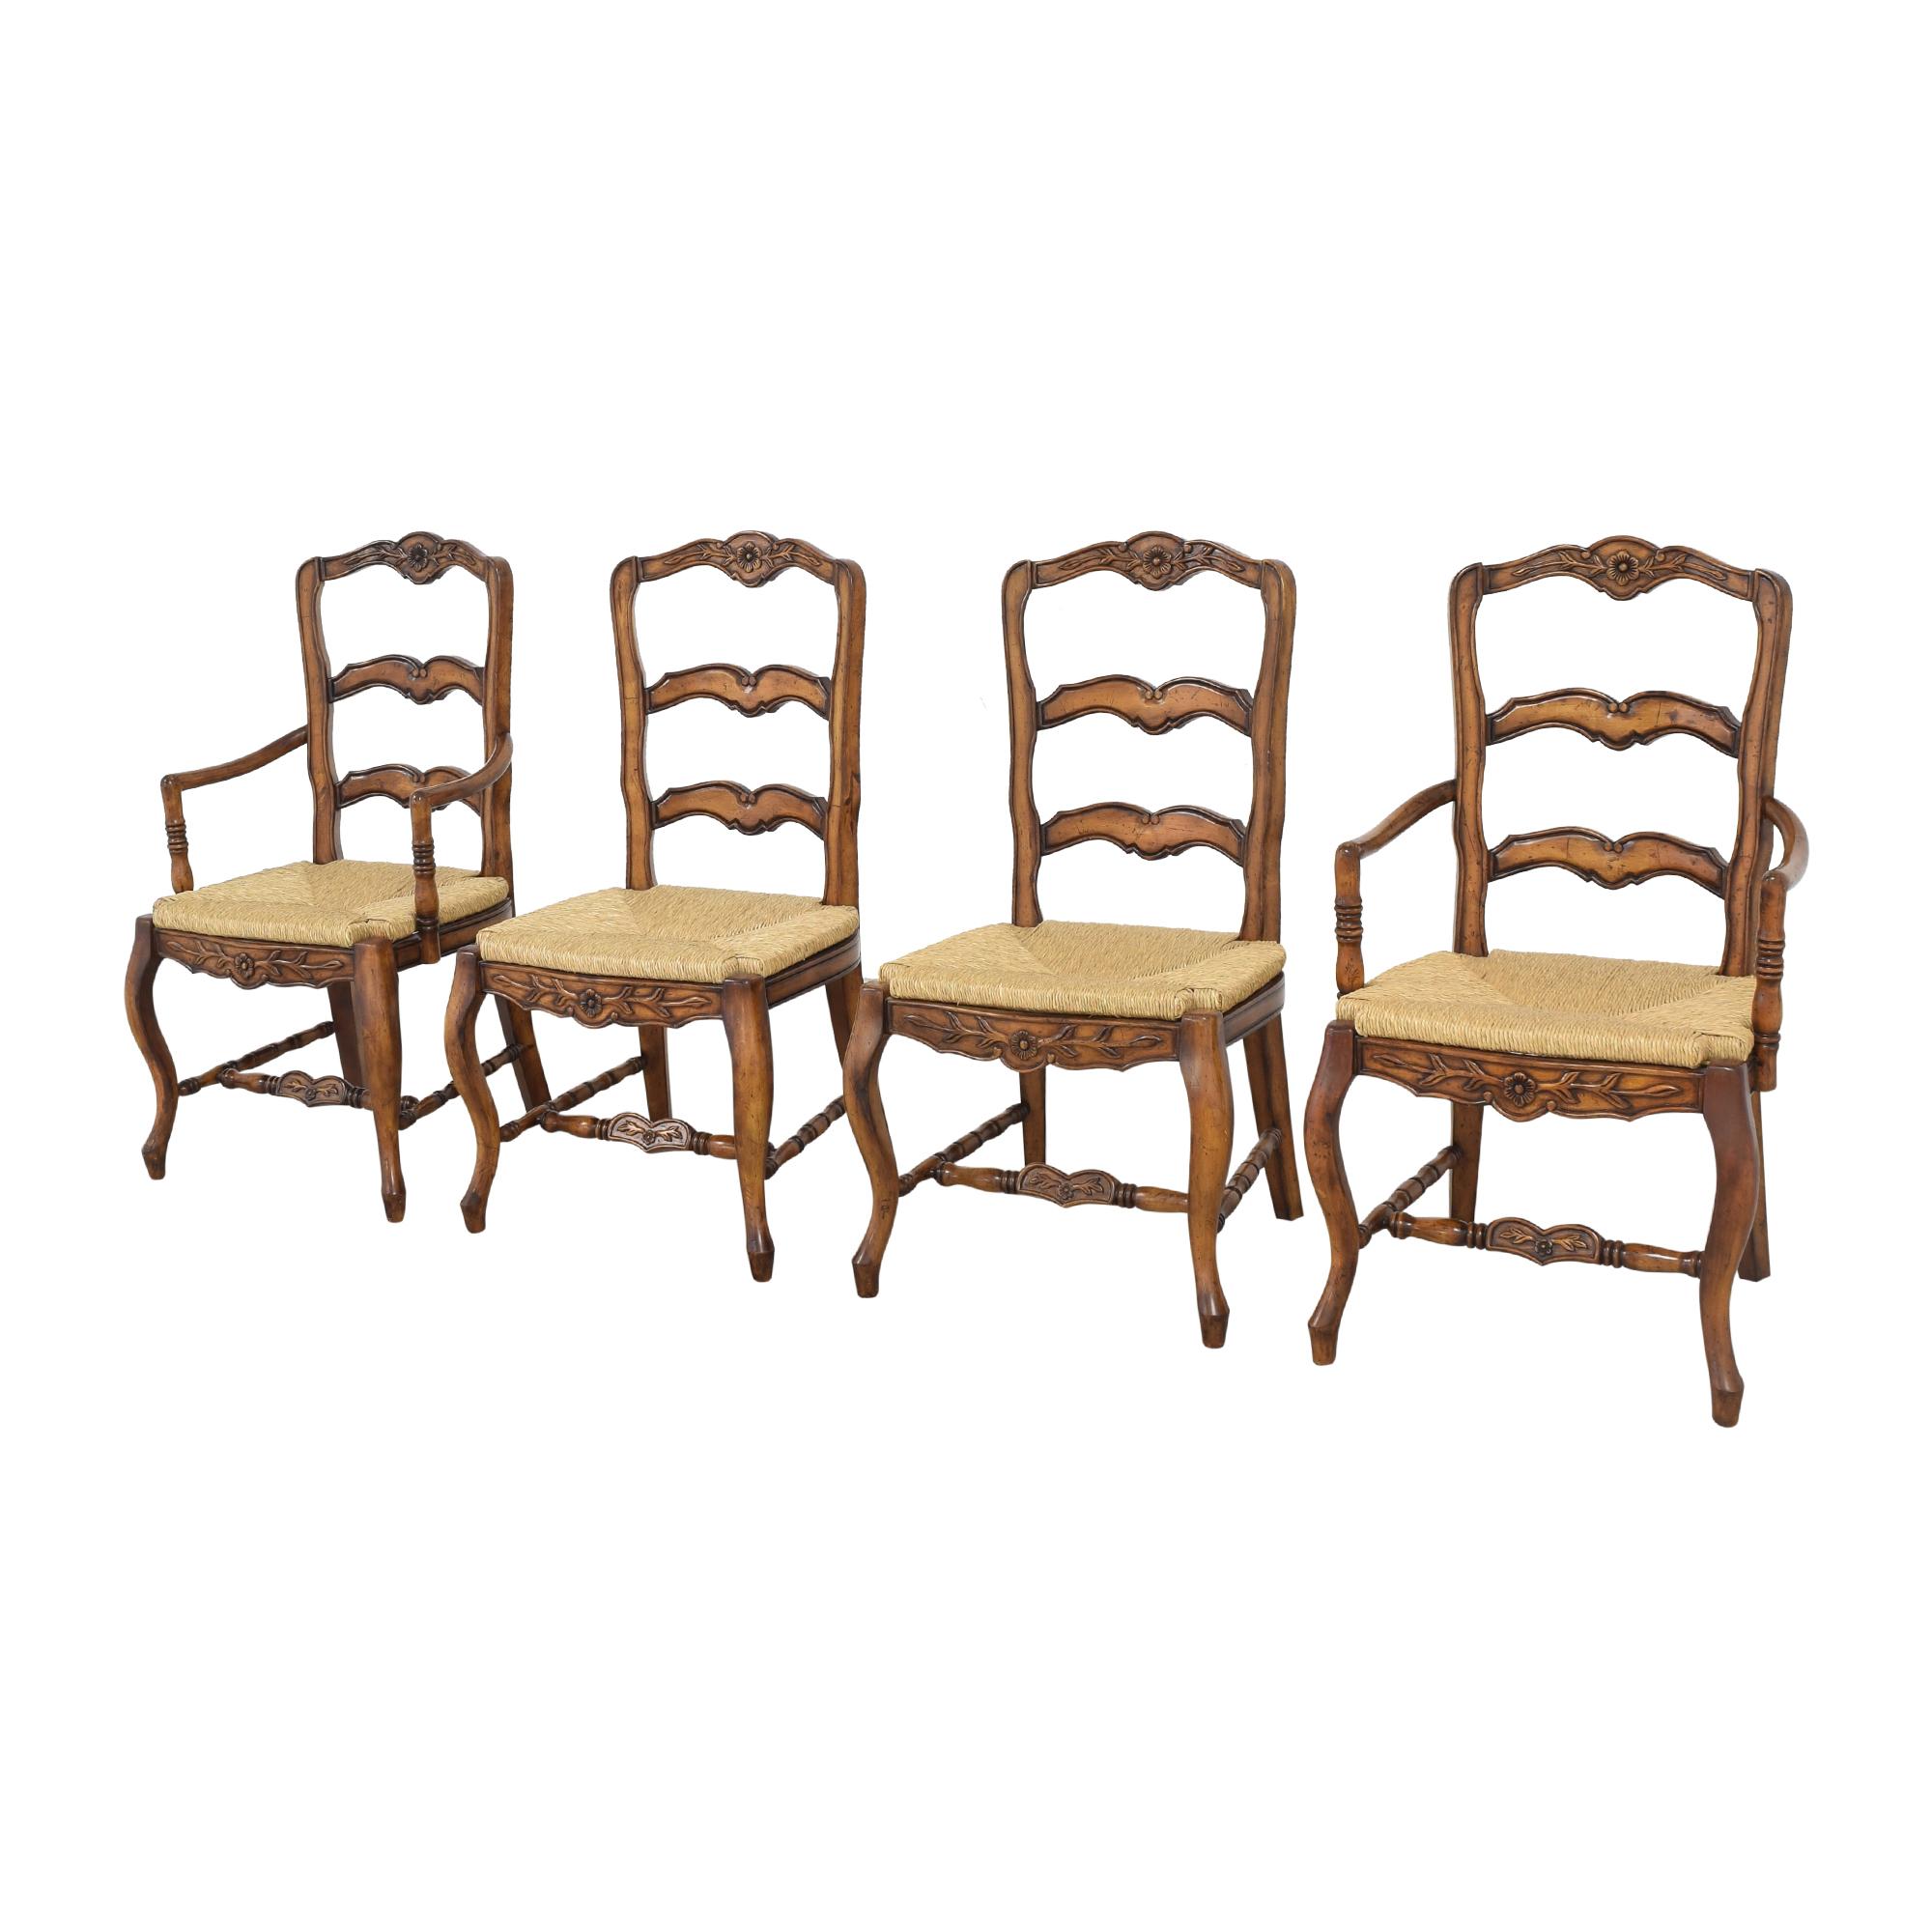 shop Artistica Cane Dining Chairs Artistica